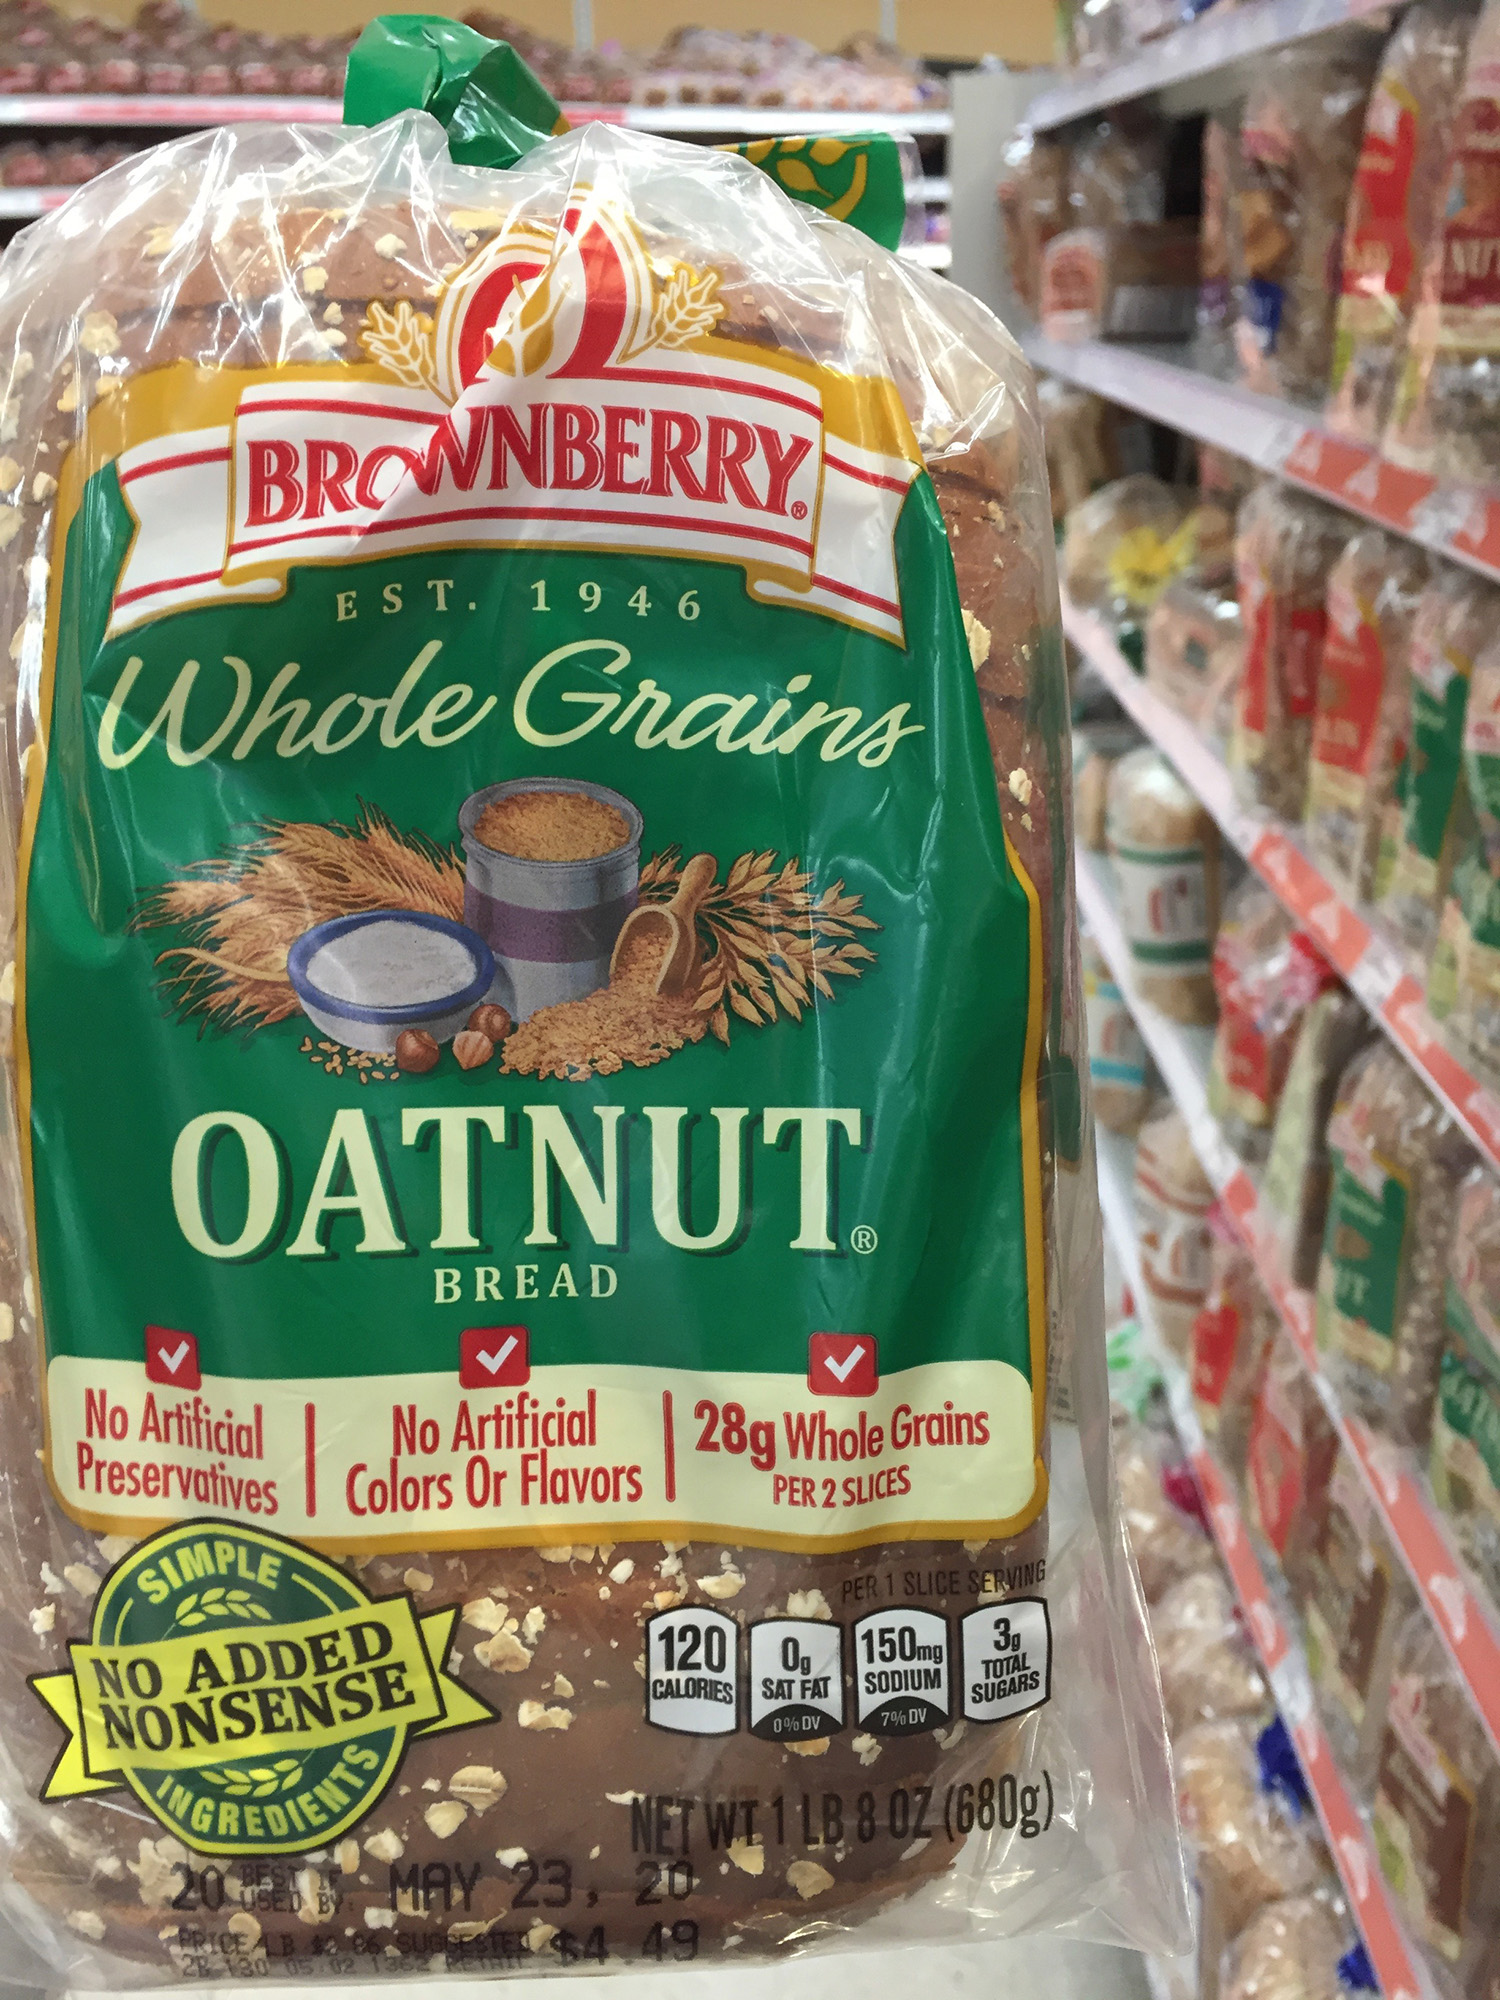 Brownberry Whole Grain Oatnut Bread (1 Loaf)